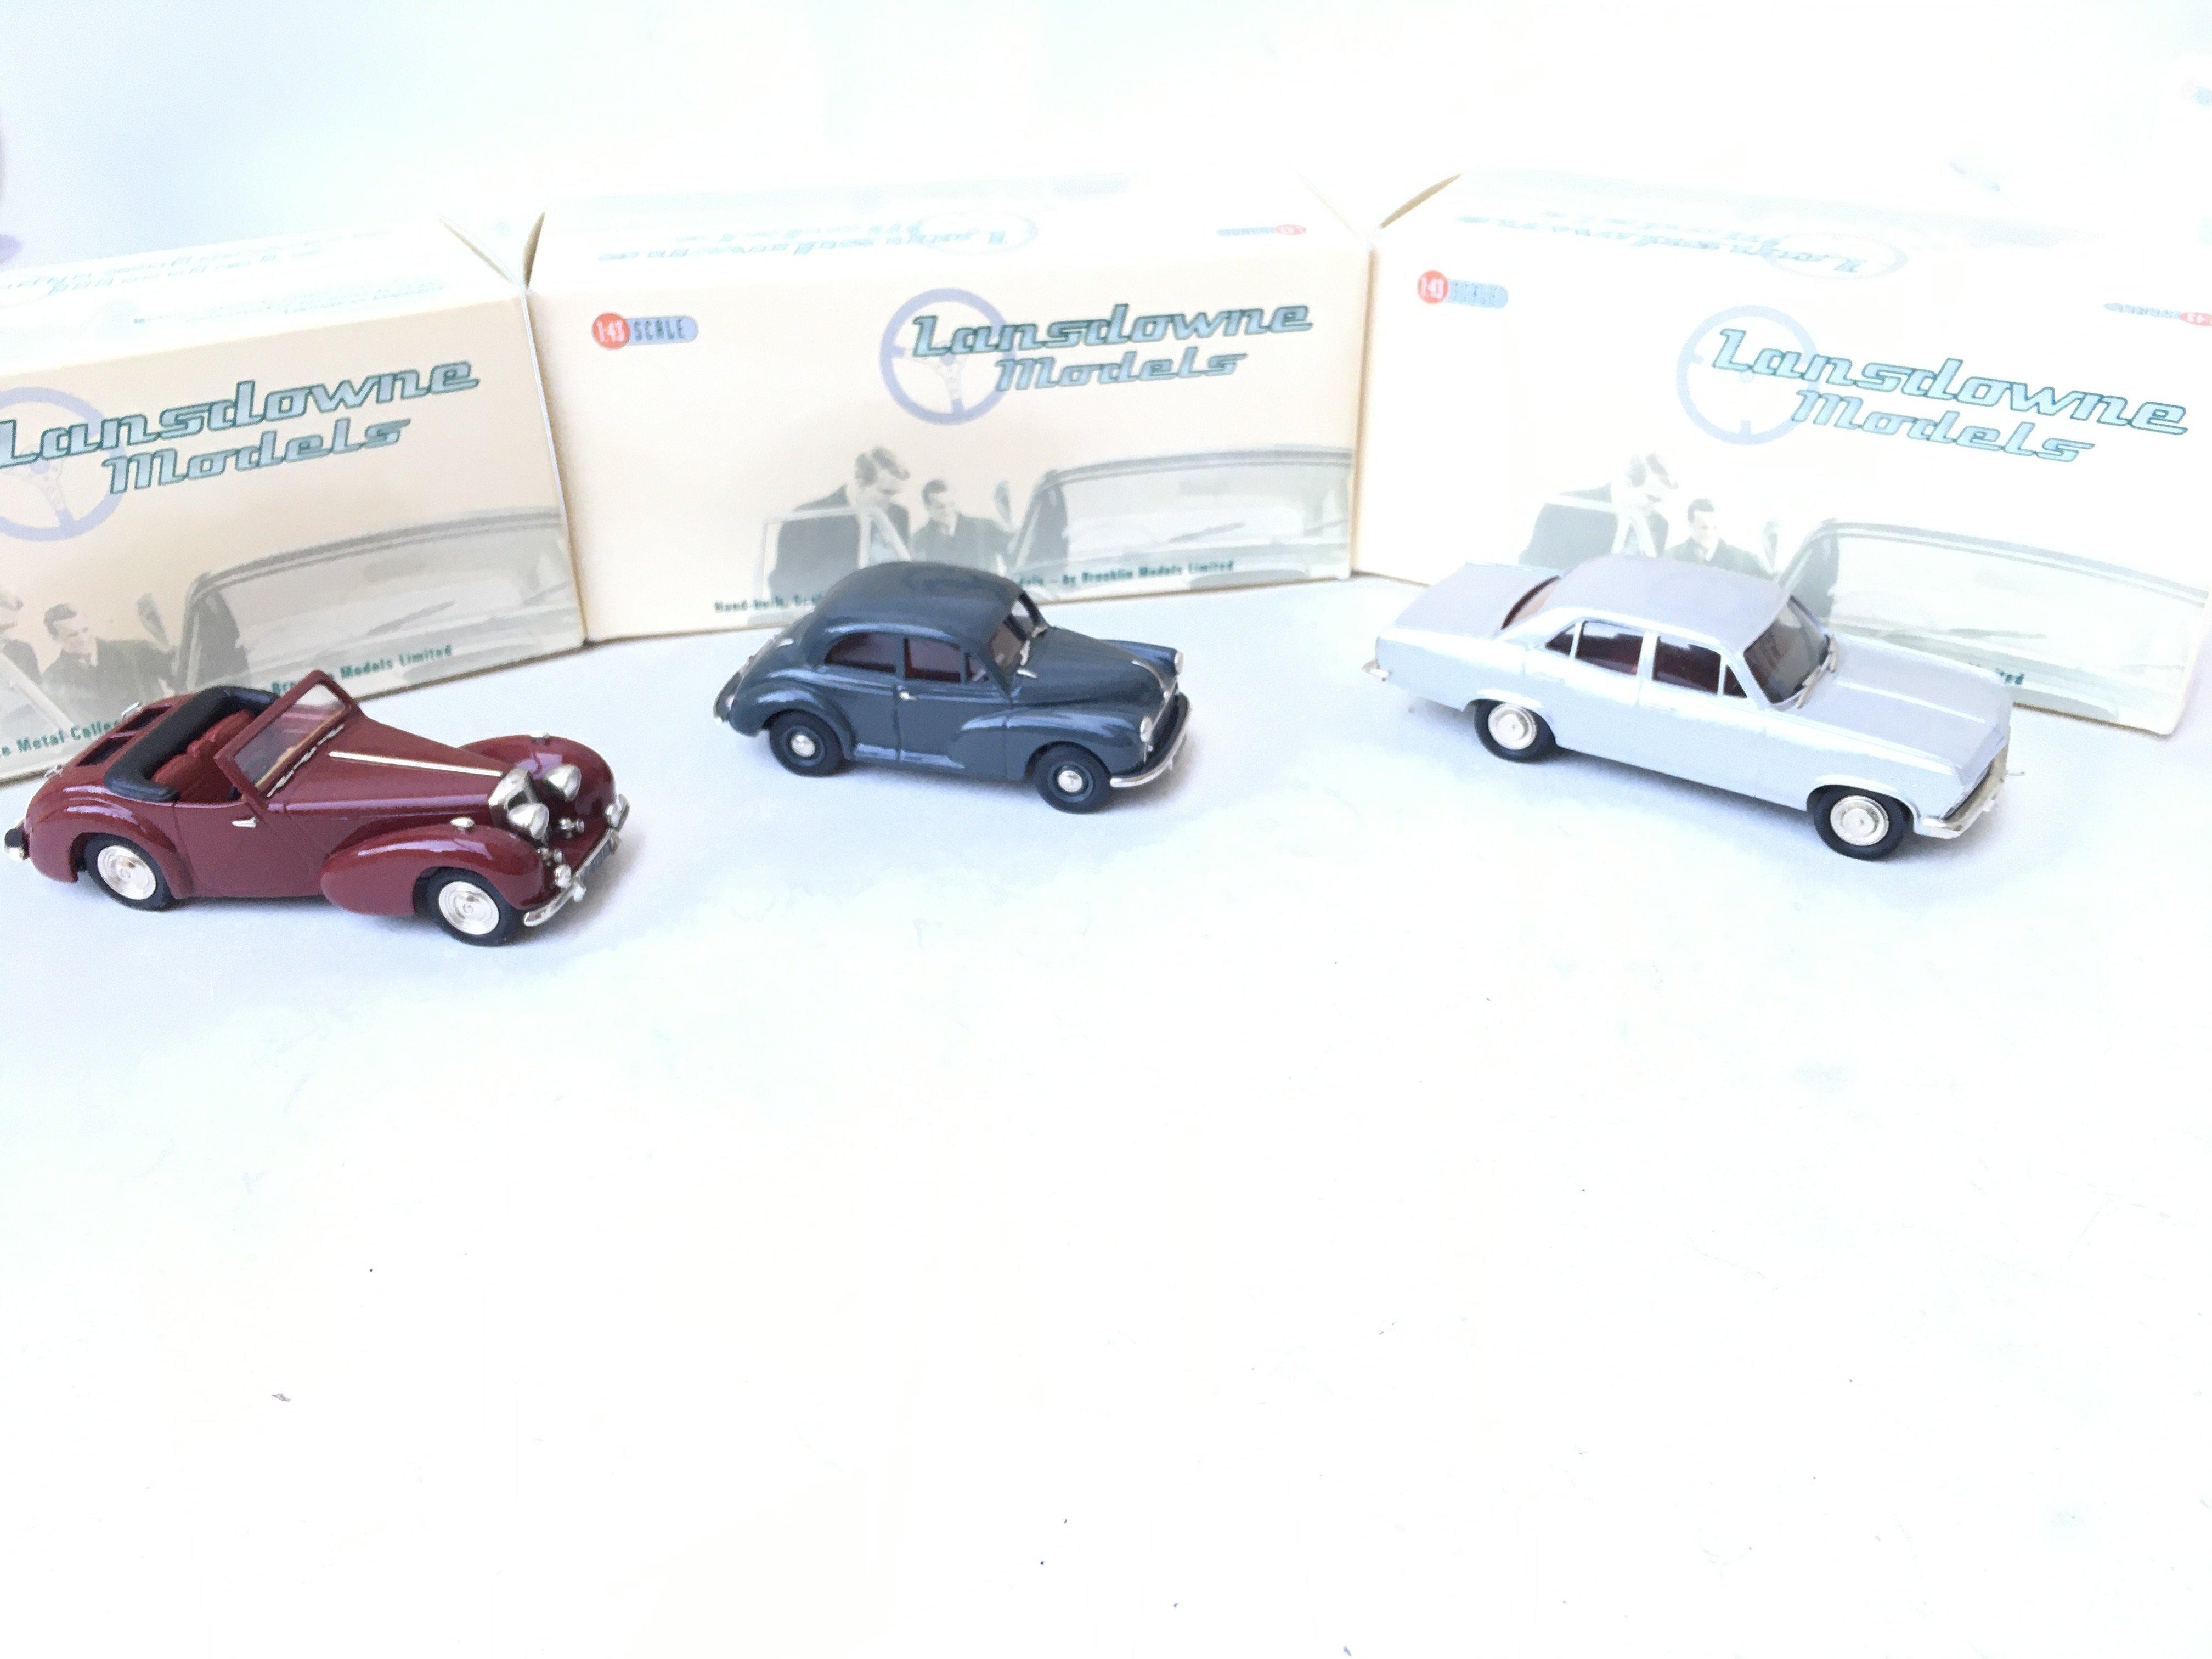 3 X Lansdowne Models including LDM 36 1952 Morris Minor Series II. LDM 37 1949 Triumph 2000 Roadster